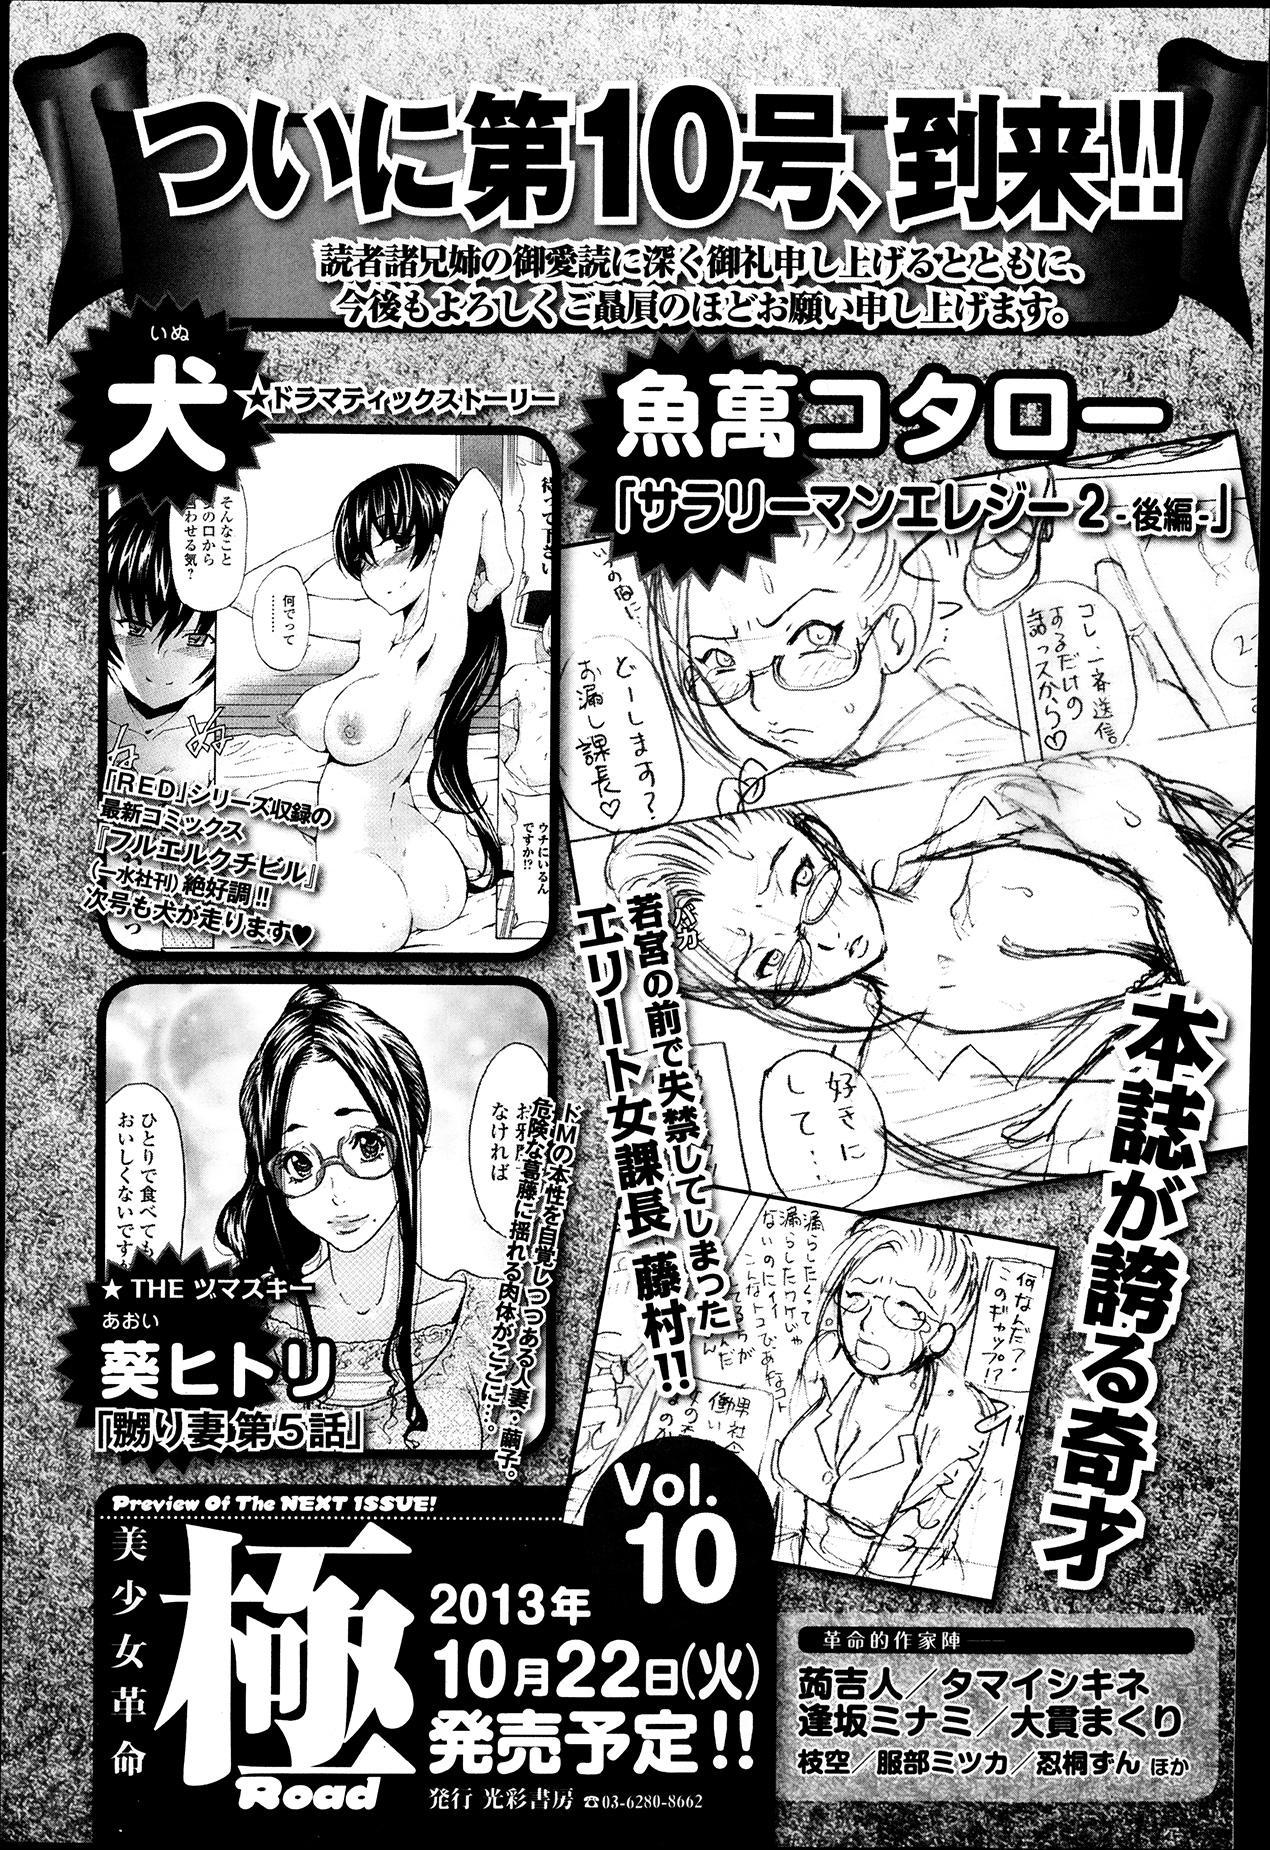 Bishoujo Kakumei KIWAME Road Vol.9 264